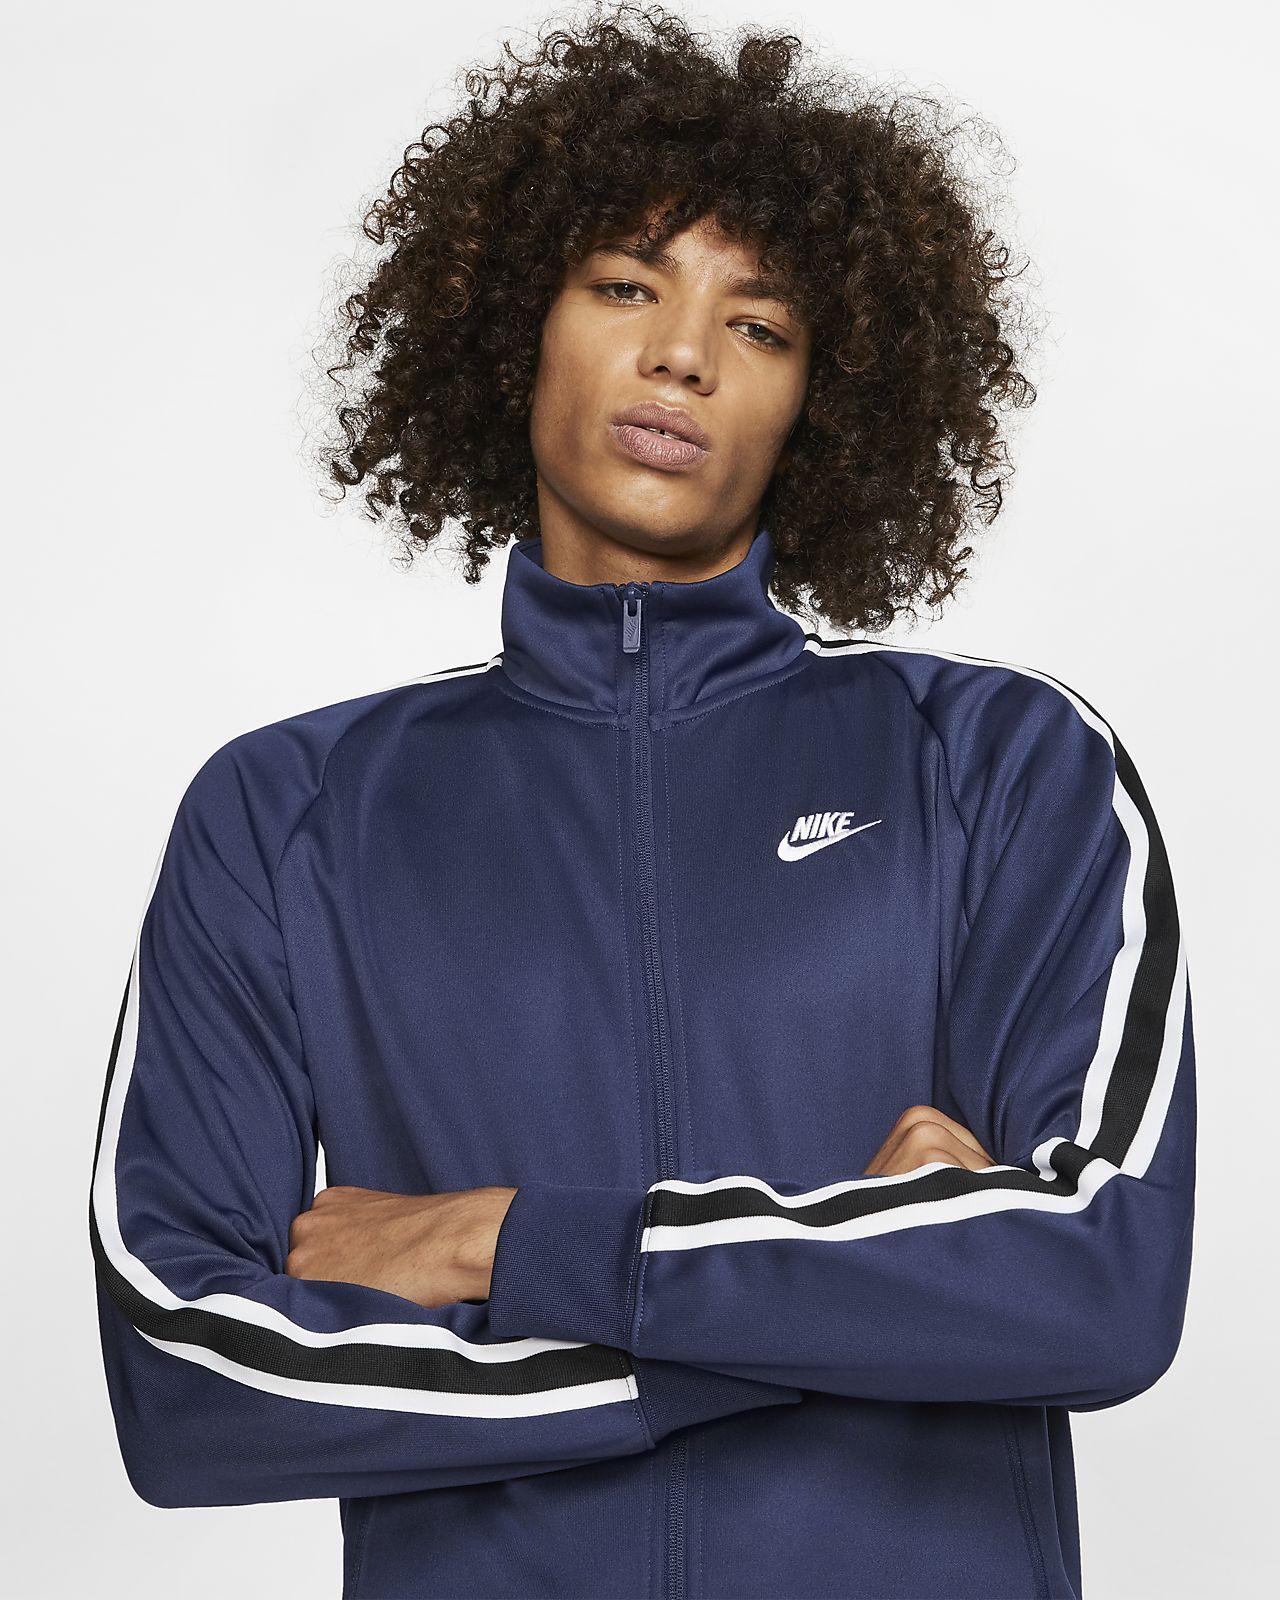 ae7ccb953 Nike Sportswear N98 Men's Knit Warm-Up Jacket. Nike.com GB